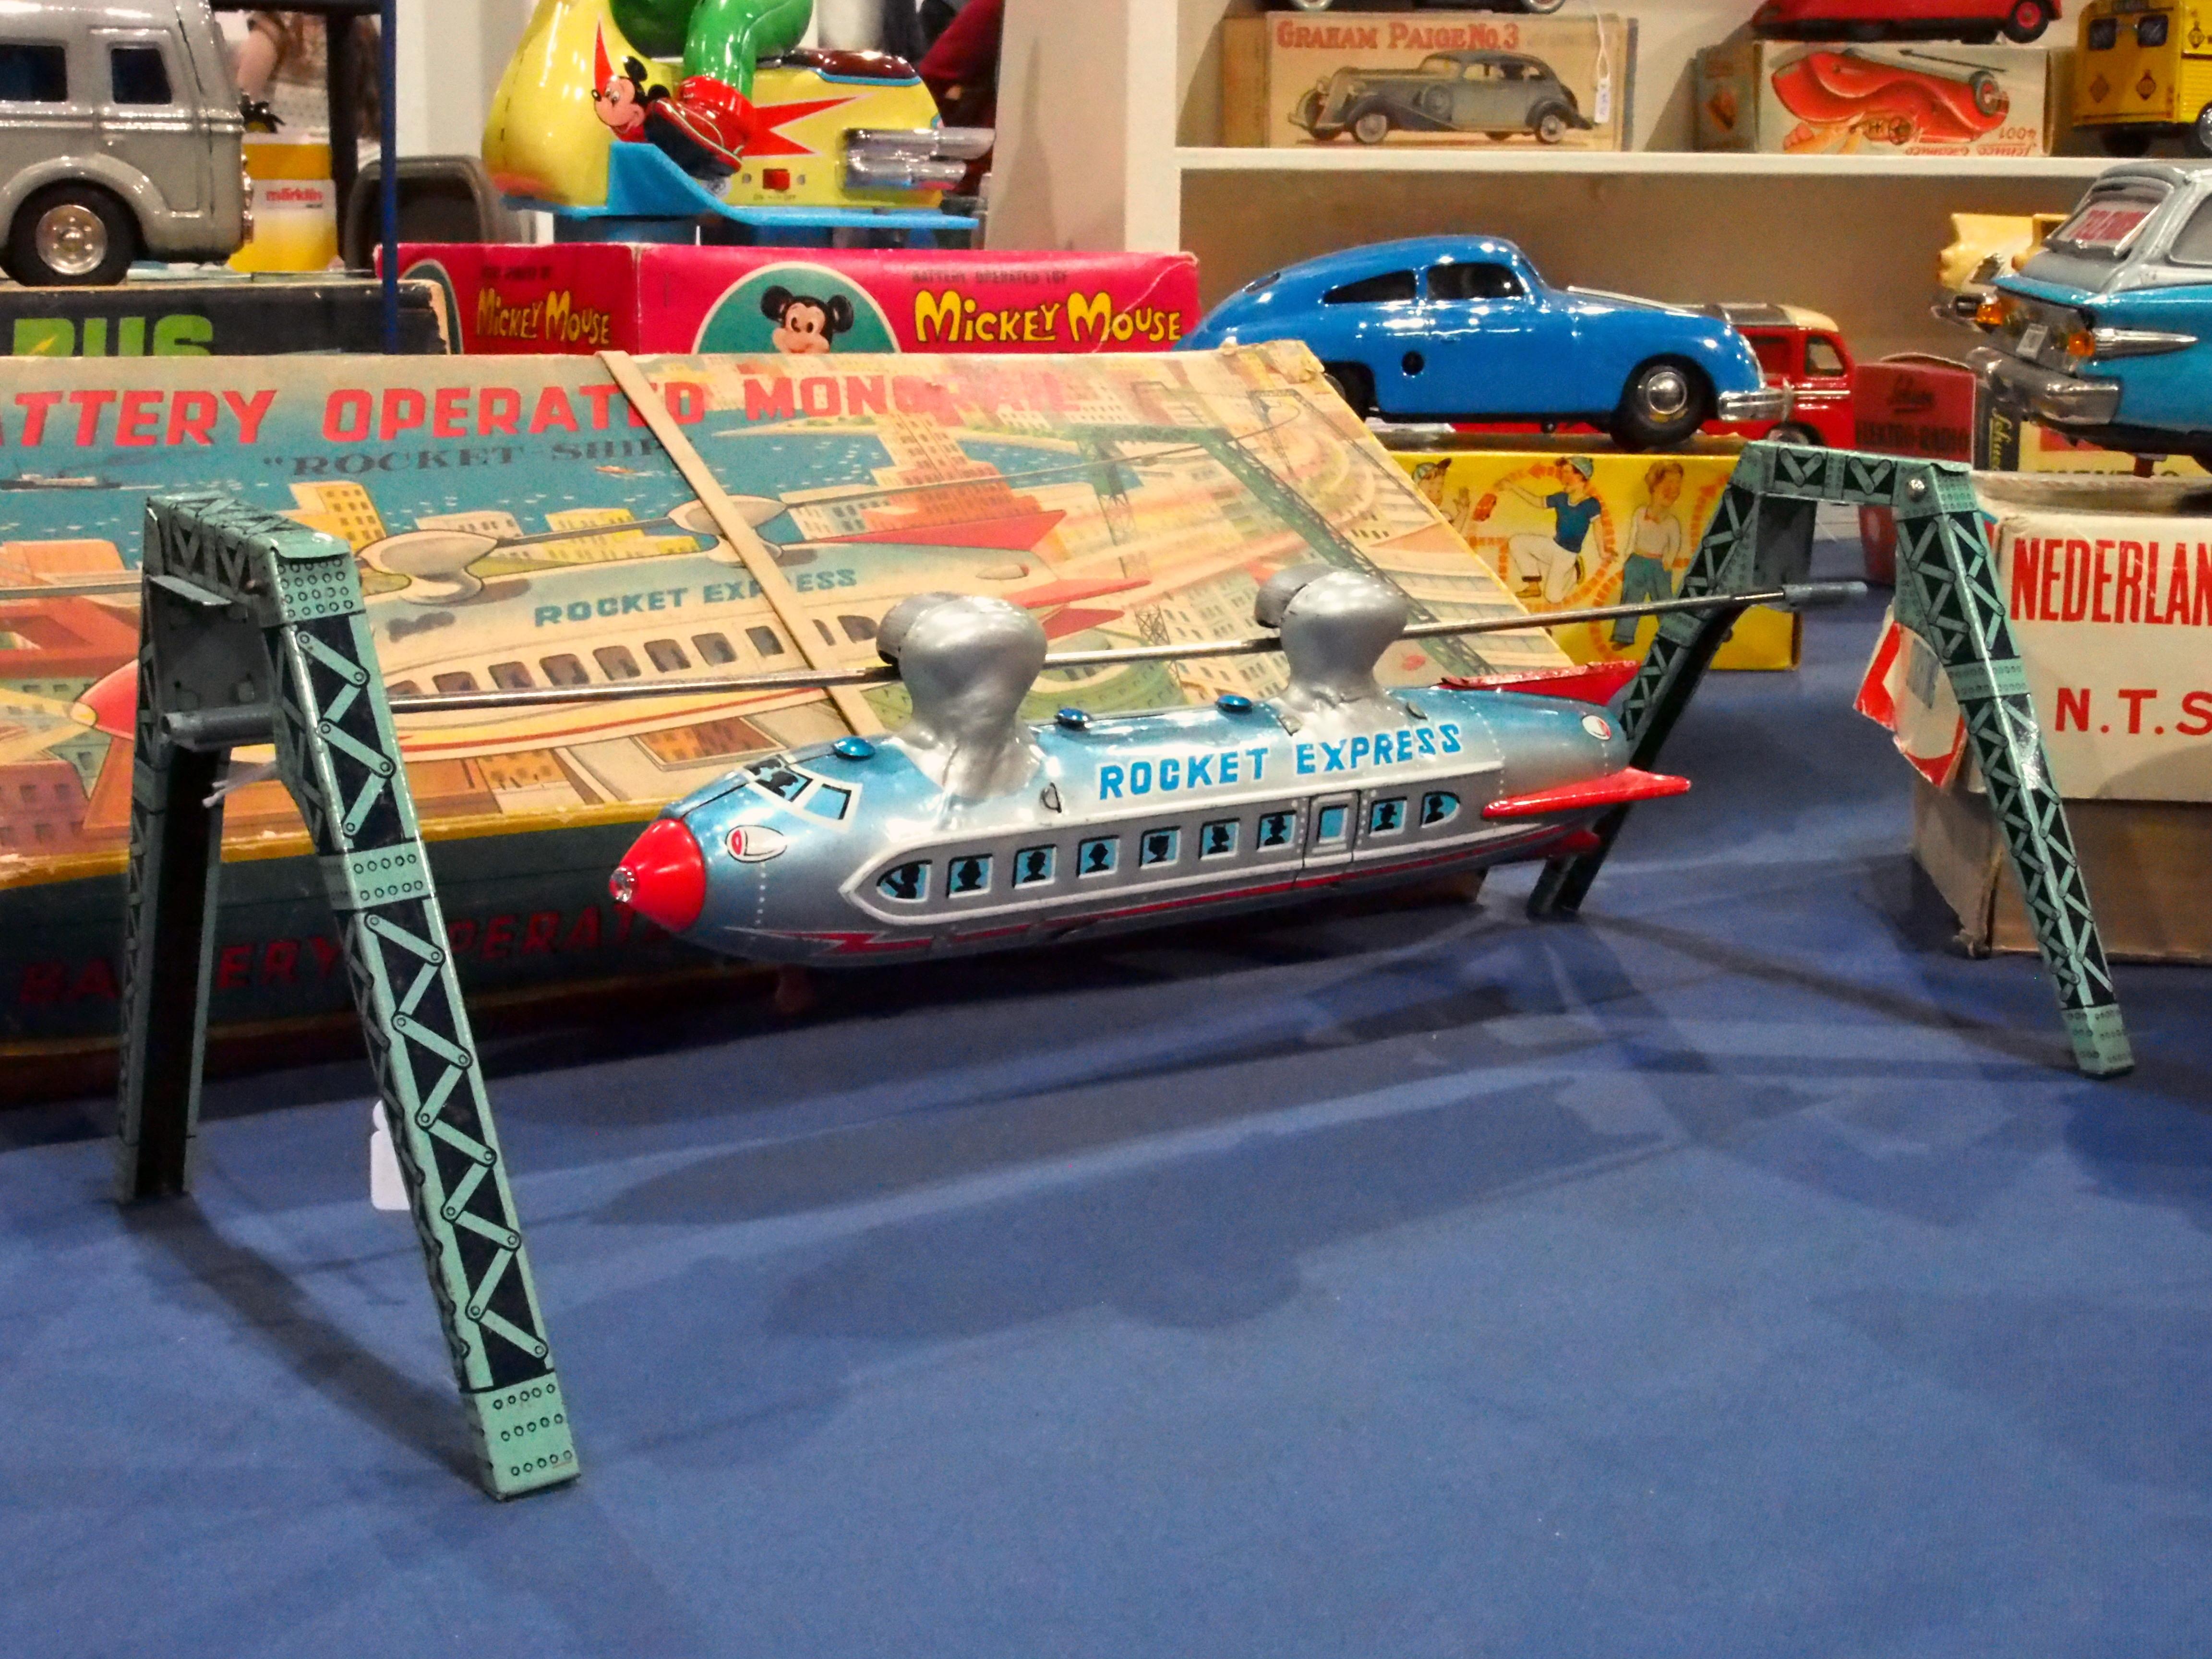 file litho tin toy monorail rocket ship linemar rocket express